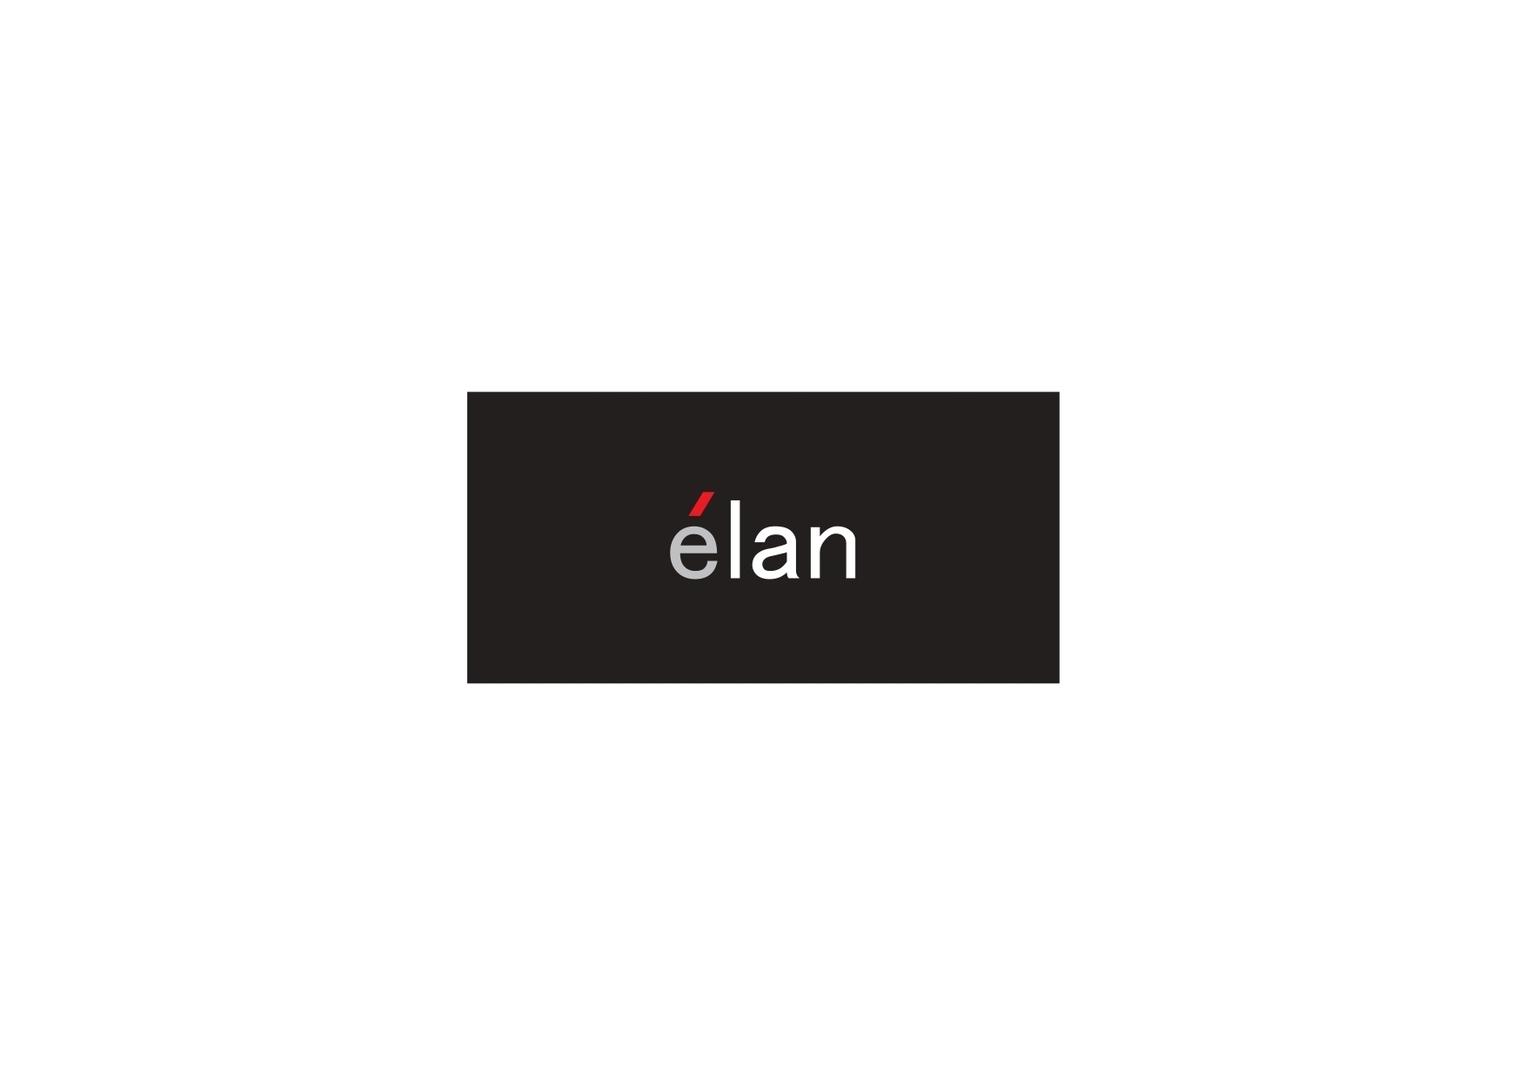 ELJ313710/WEBマーケティング(WEB広告運用、SNSアカウント運営)のカバー写真